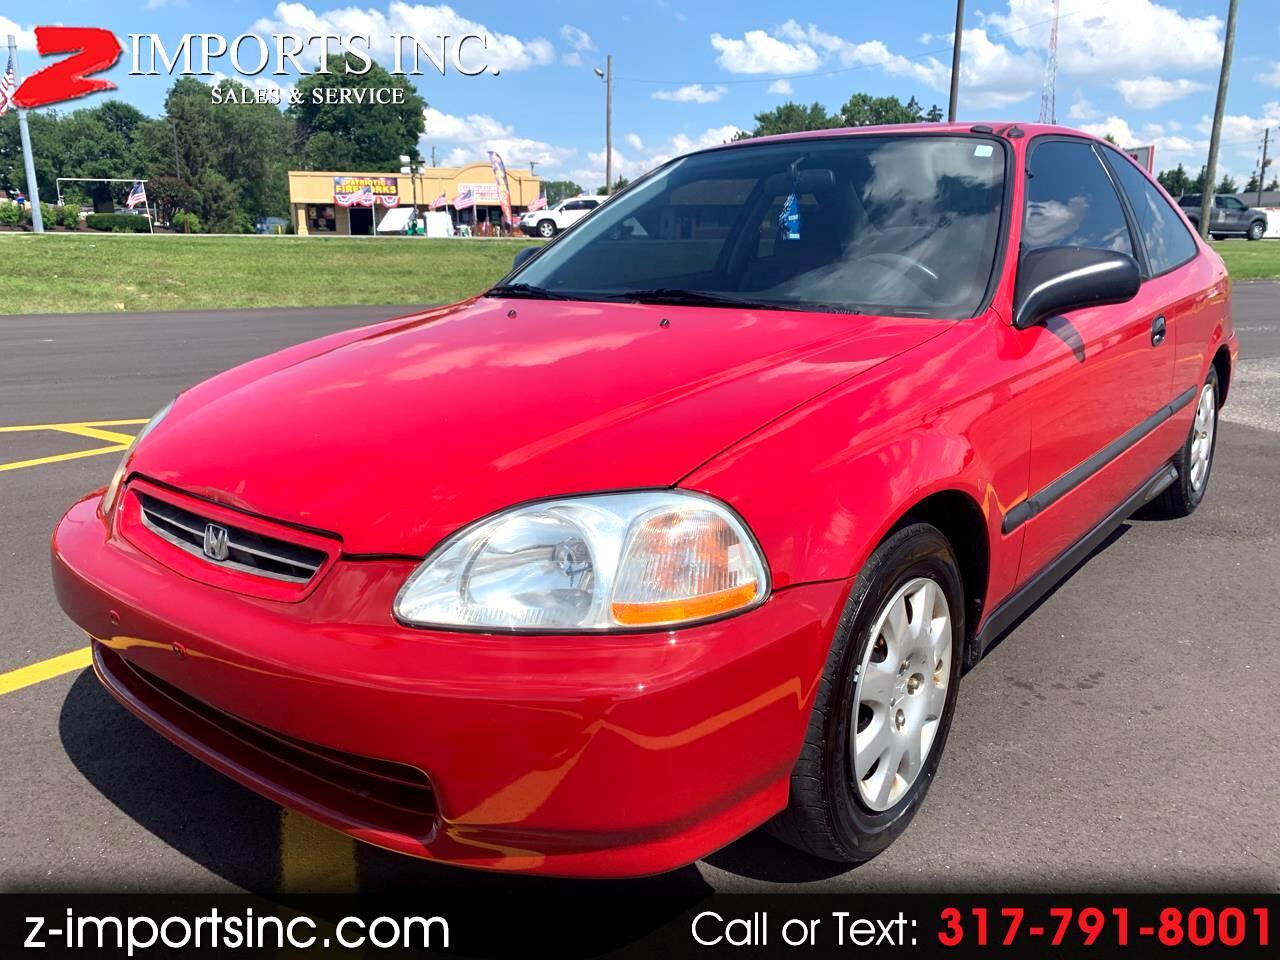 1998 Honda Civic DX coupe